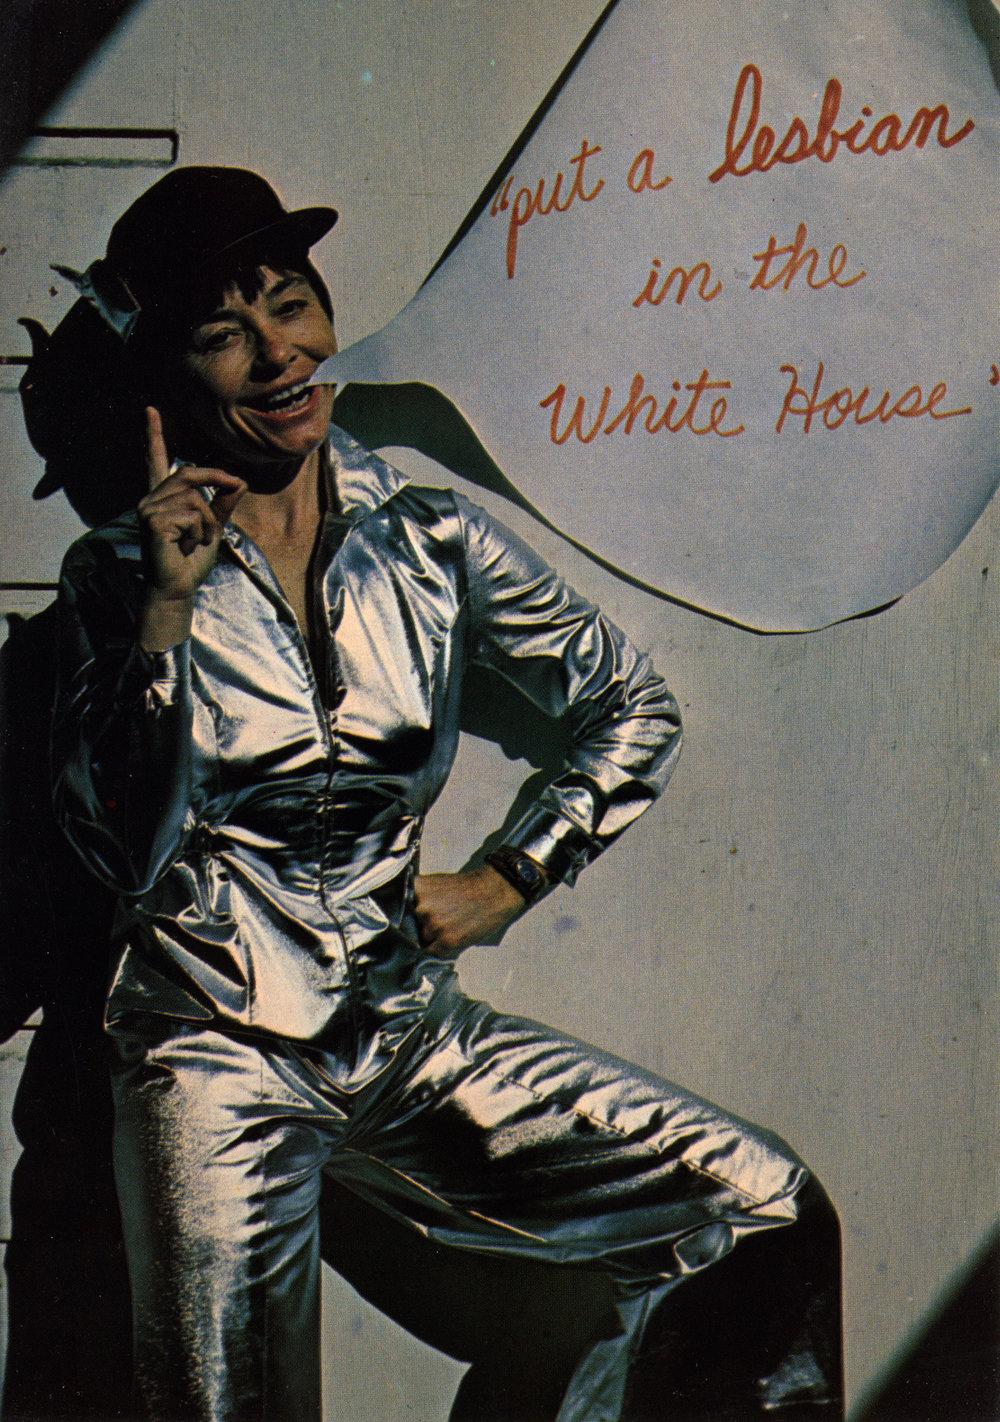 Barbara Hammer, Performance&Postcared,  Puta a Lesbian in the White House , 1979